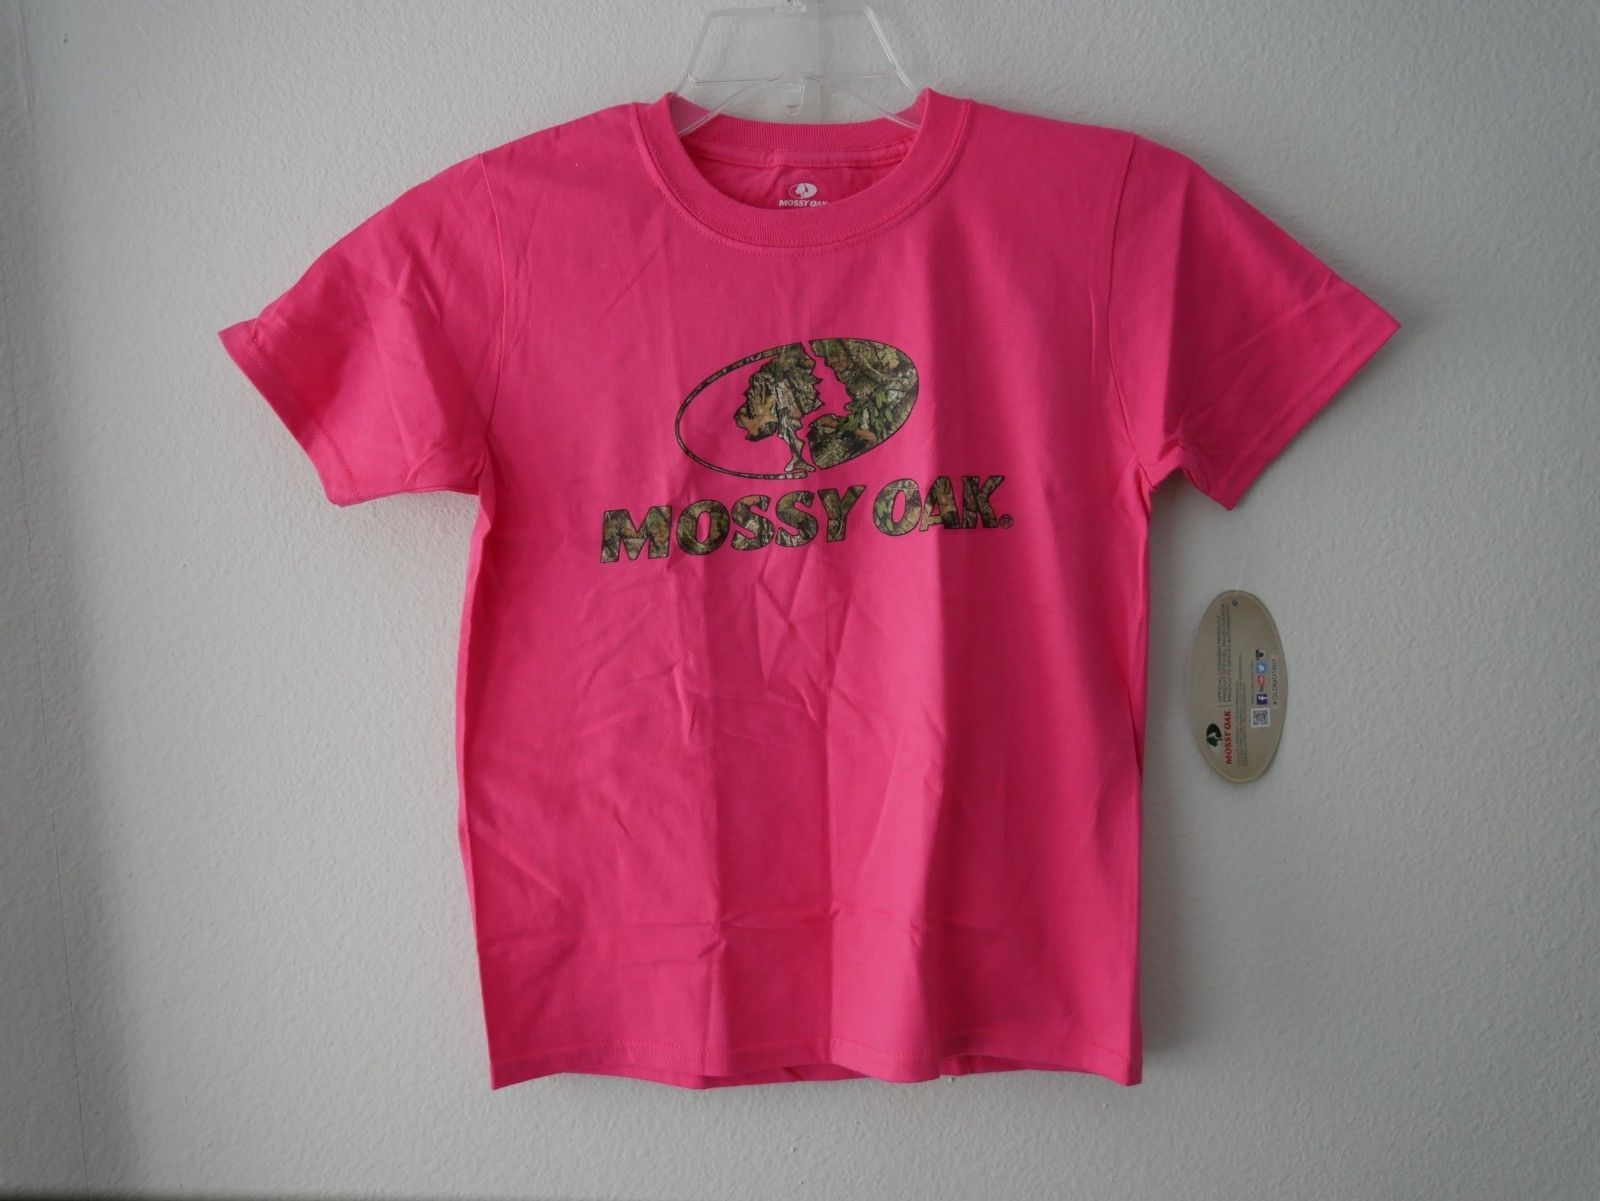 AEROPOSTALE Pink Glitter Short Sleeve Shirt Size 14 NWT Girls P.S